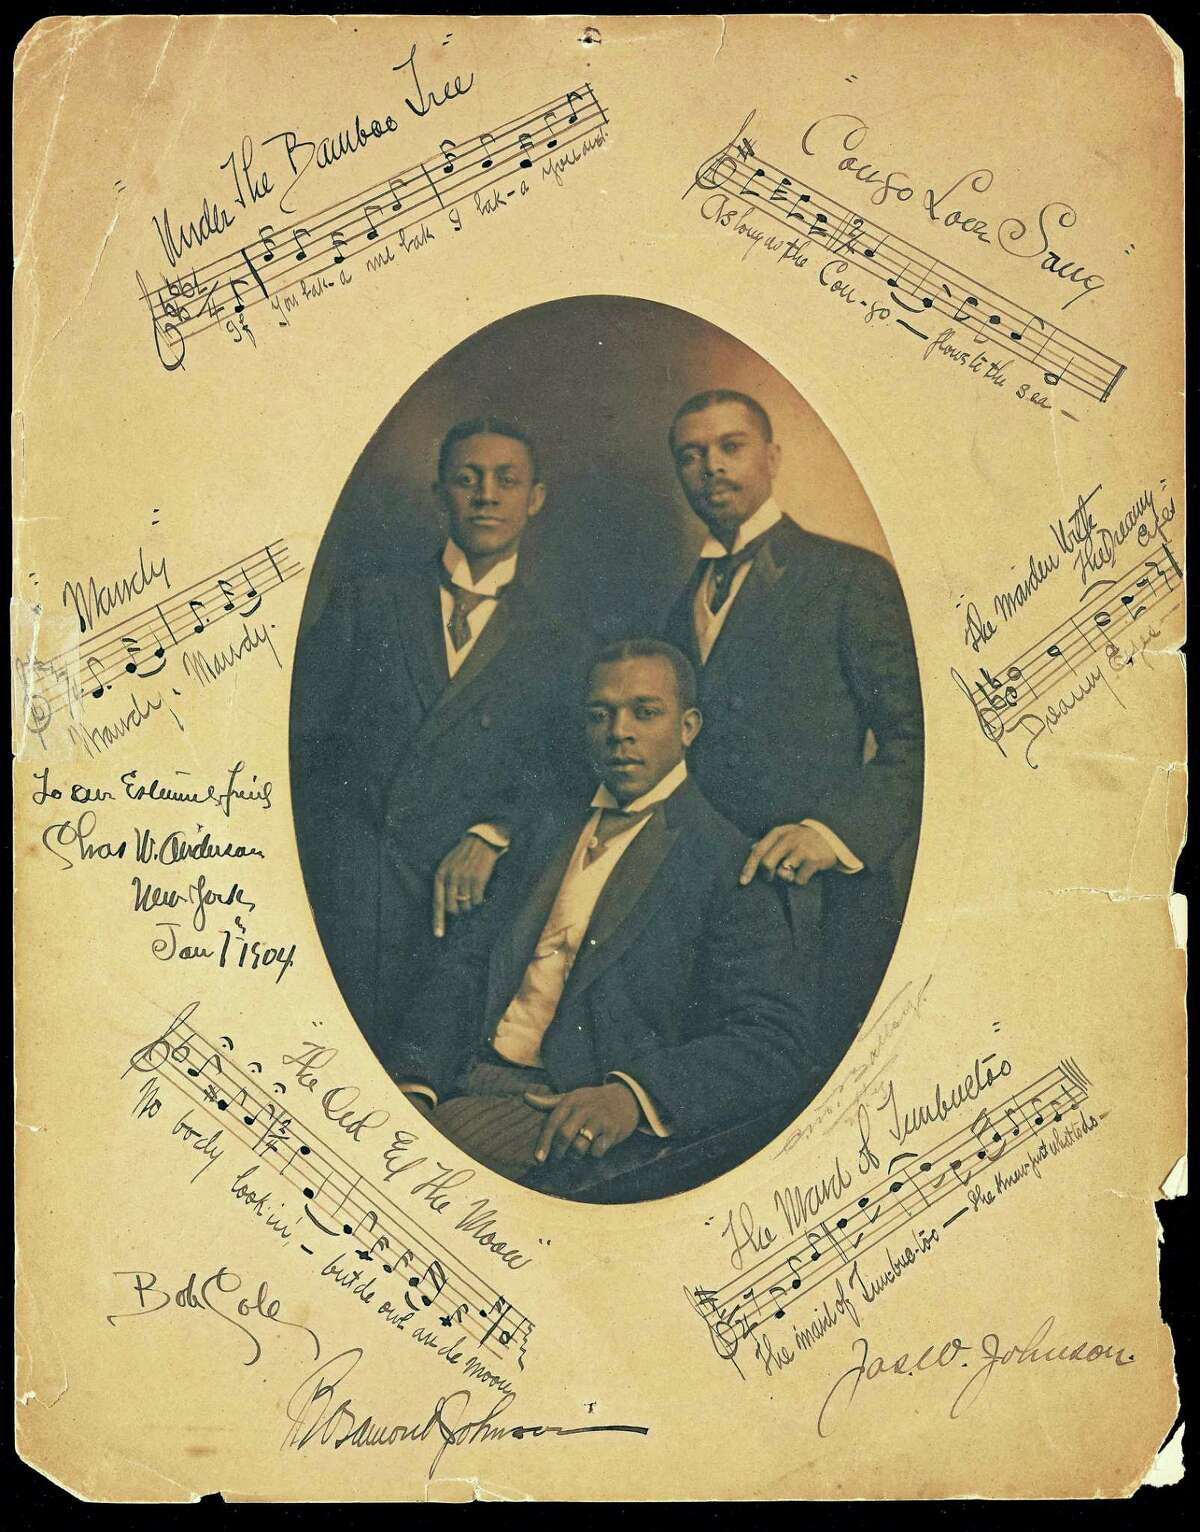 Bob Cole, J. Rosamond Johnson and his brother James Weldon Johnson, with inscriptions to John Nail, 1904.